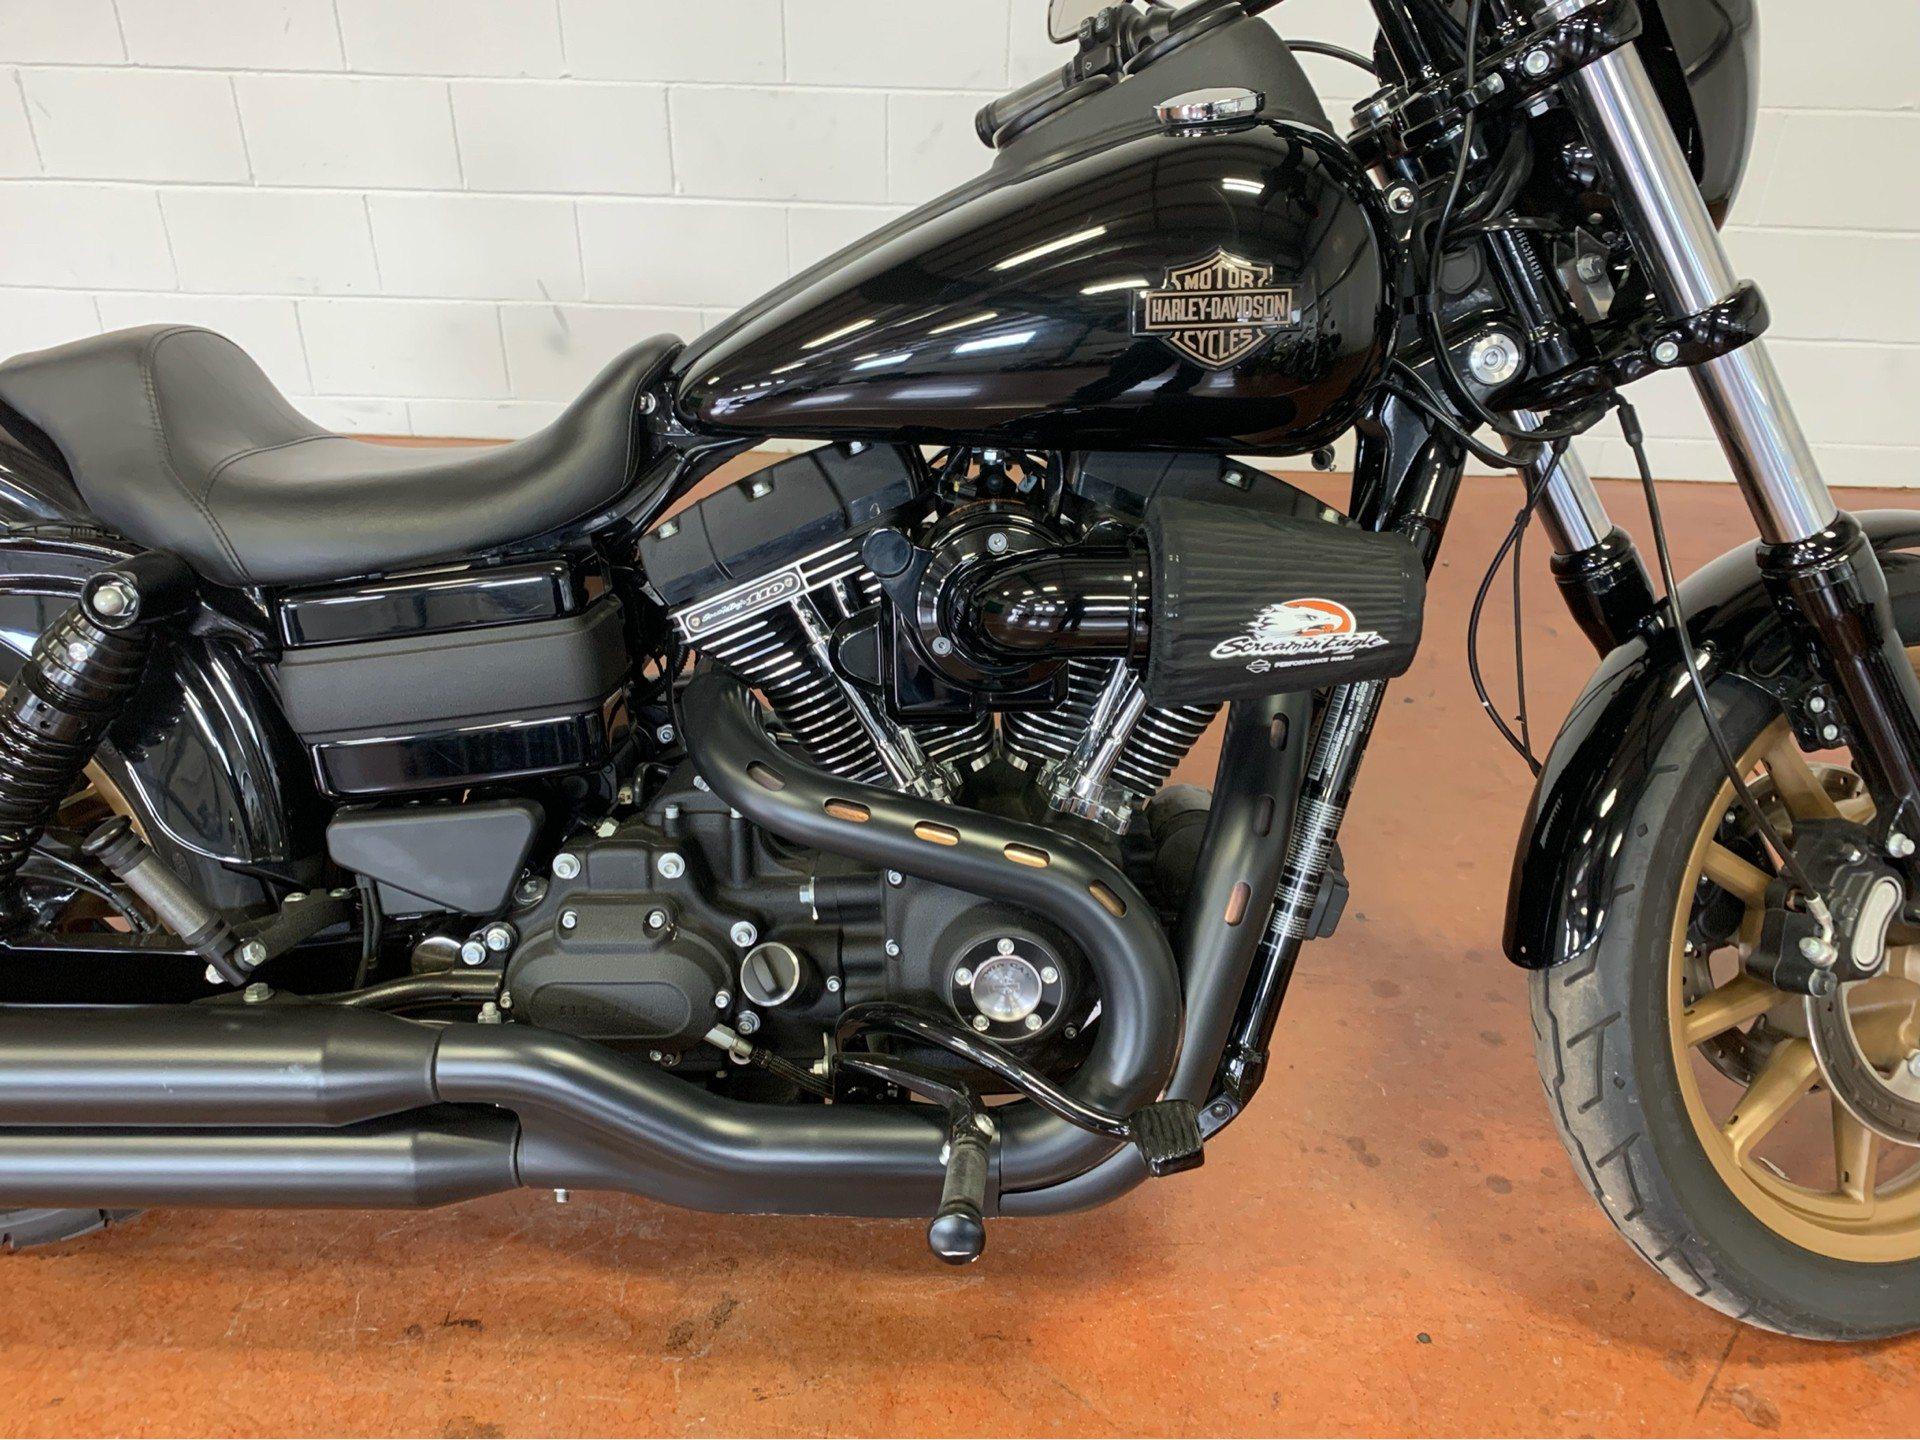 2016 Harley Davidson Low Rider S In Sunbury Ohio